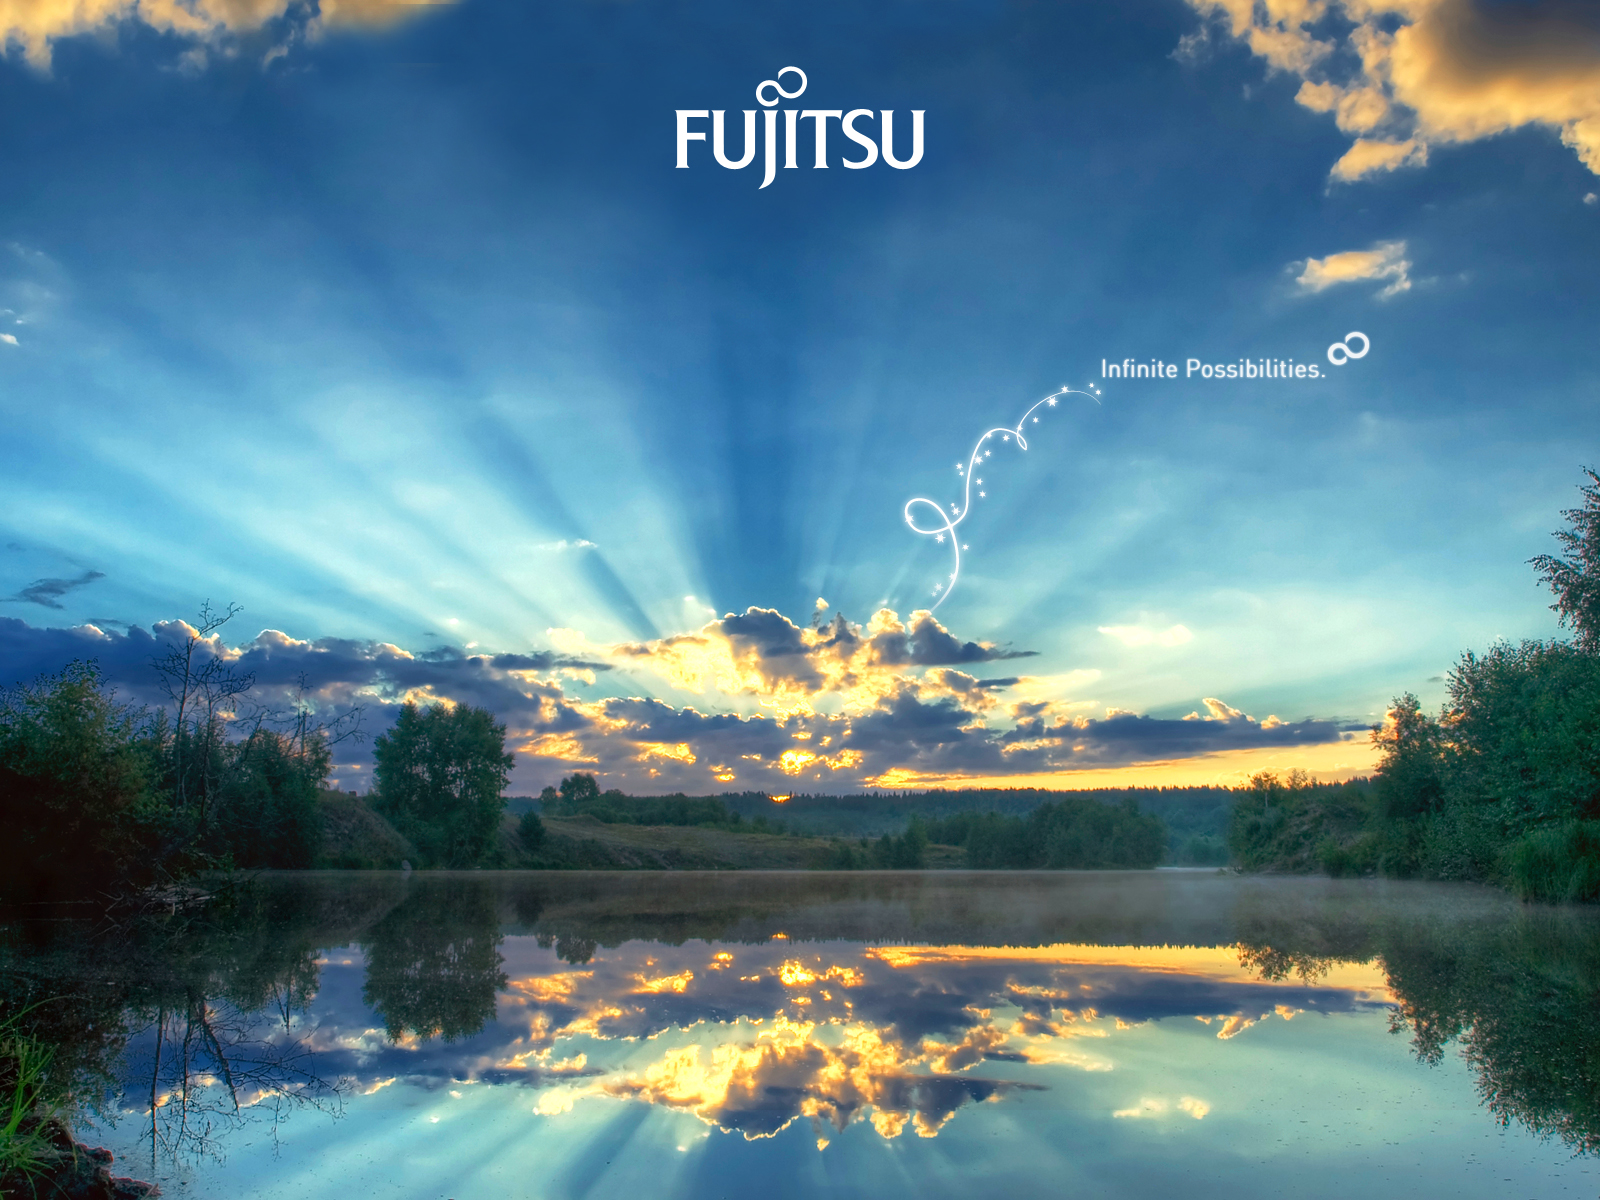 Compaq Wallpaper Hd Fujitsu Wallpaper And Background Image 1600x1200 Id 473963